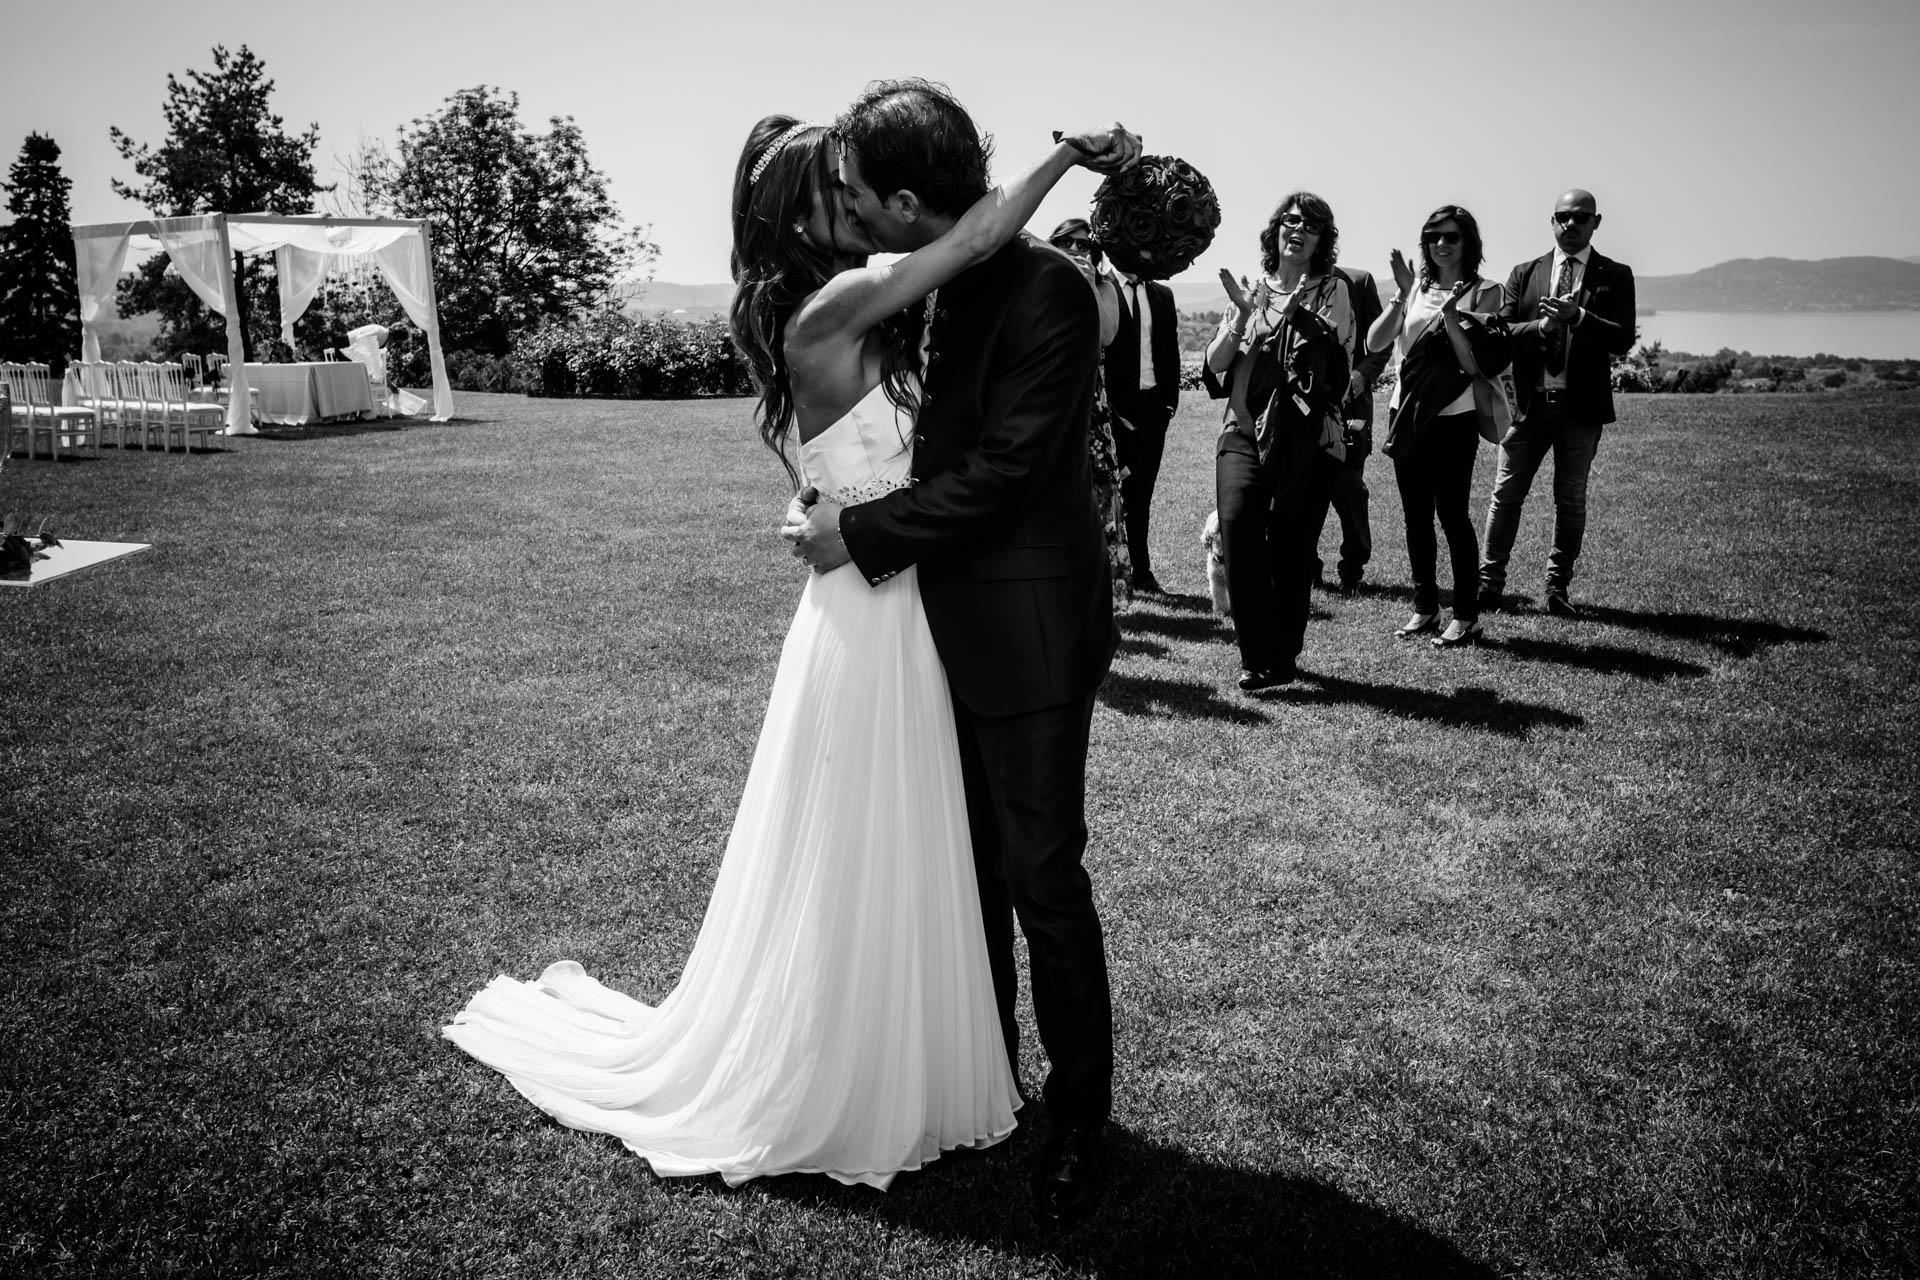 sposi bacio invitati ricevimento bianco nero